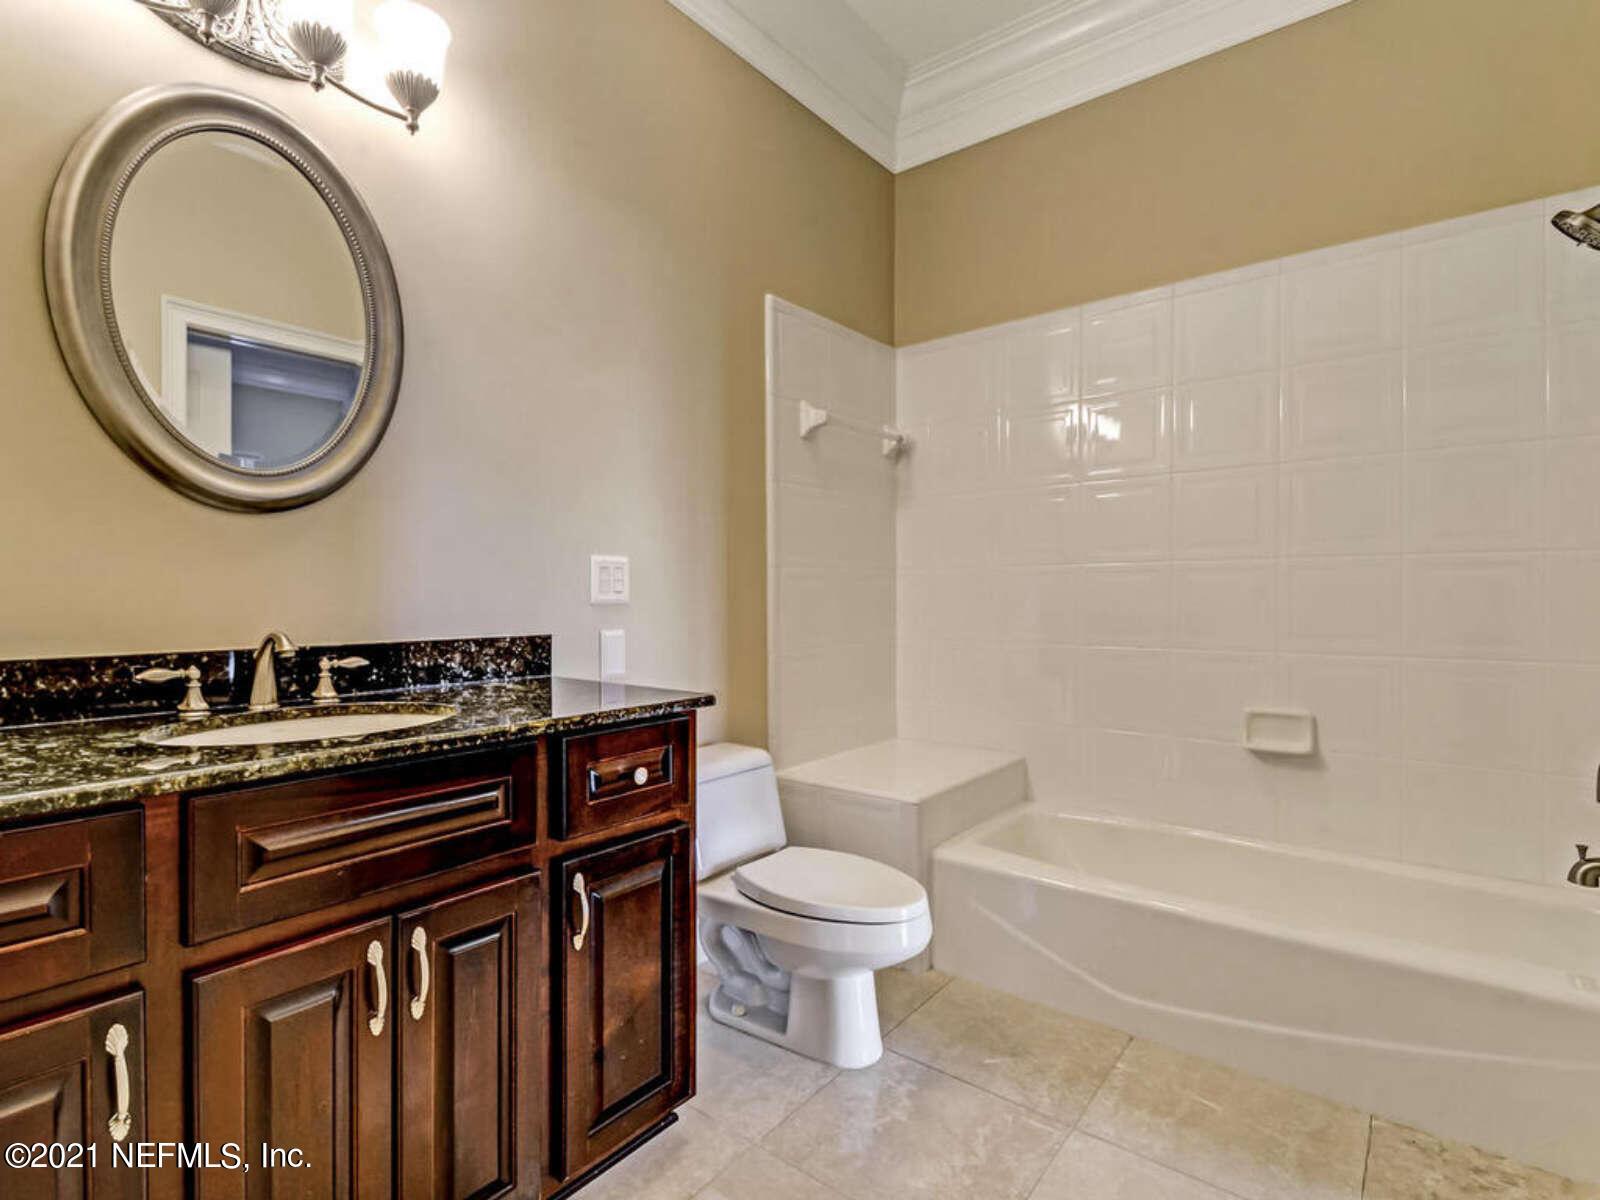 12434 MANDARIN, JACKSONVILLE, FLORIDA 32223, 5 Bedrooms Bedrooms, ,7 BathroomsBathrooms,Residential,For sale,MANDARIN,1085901